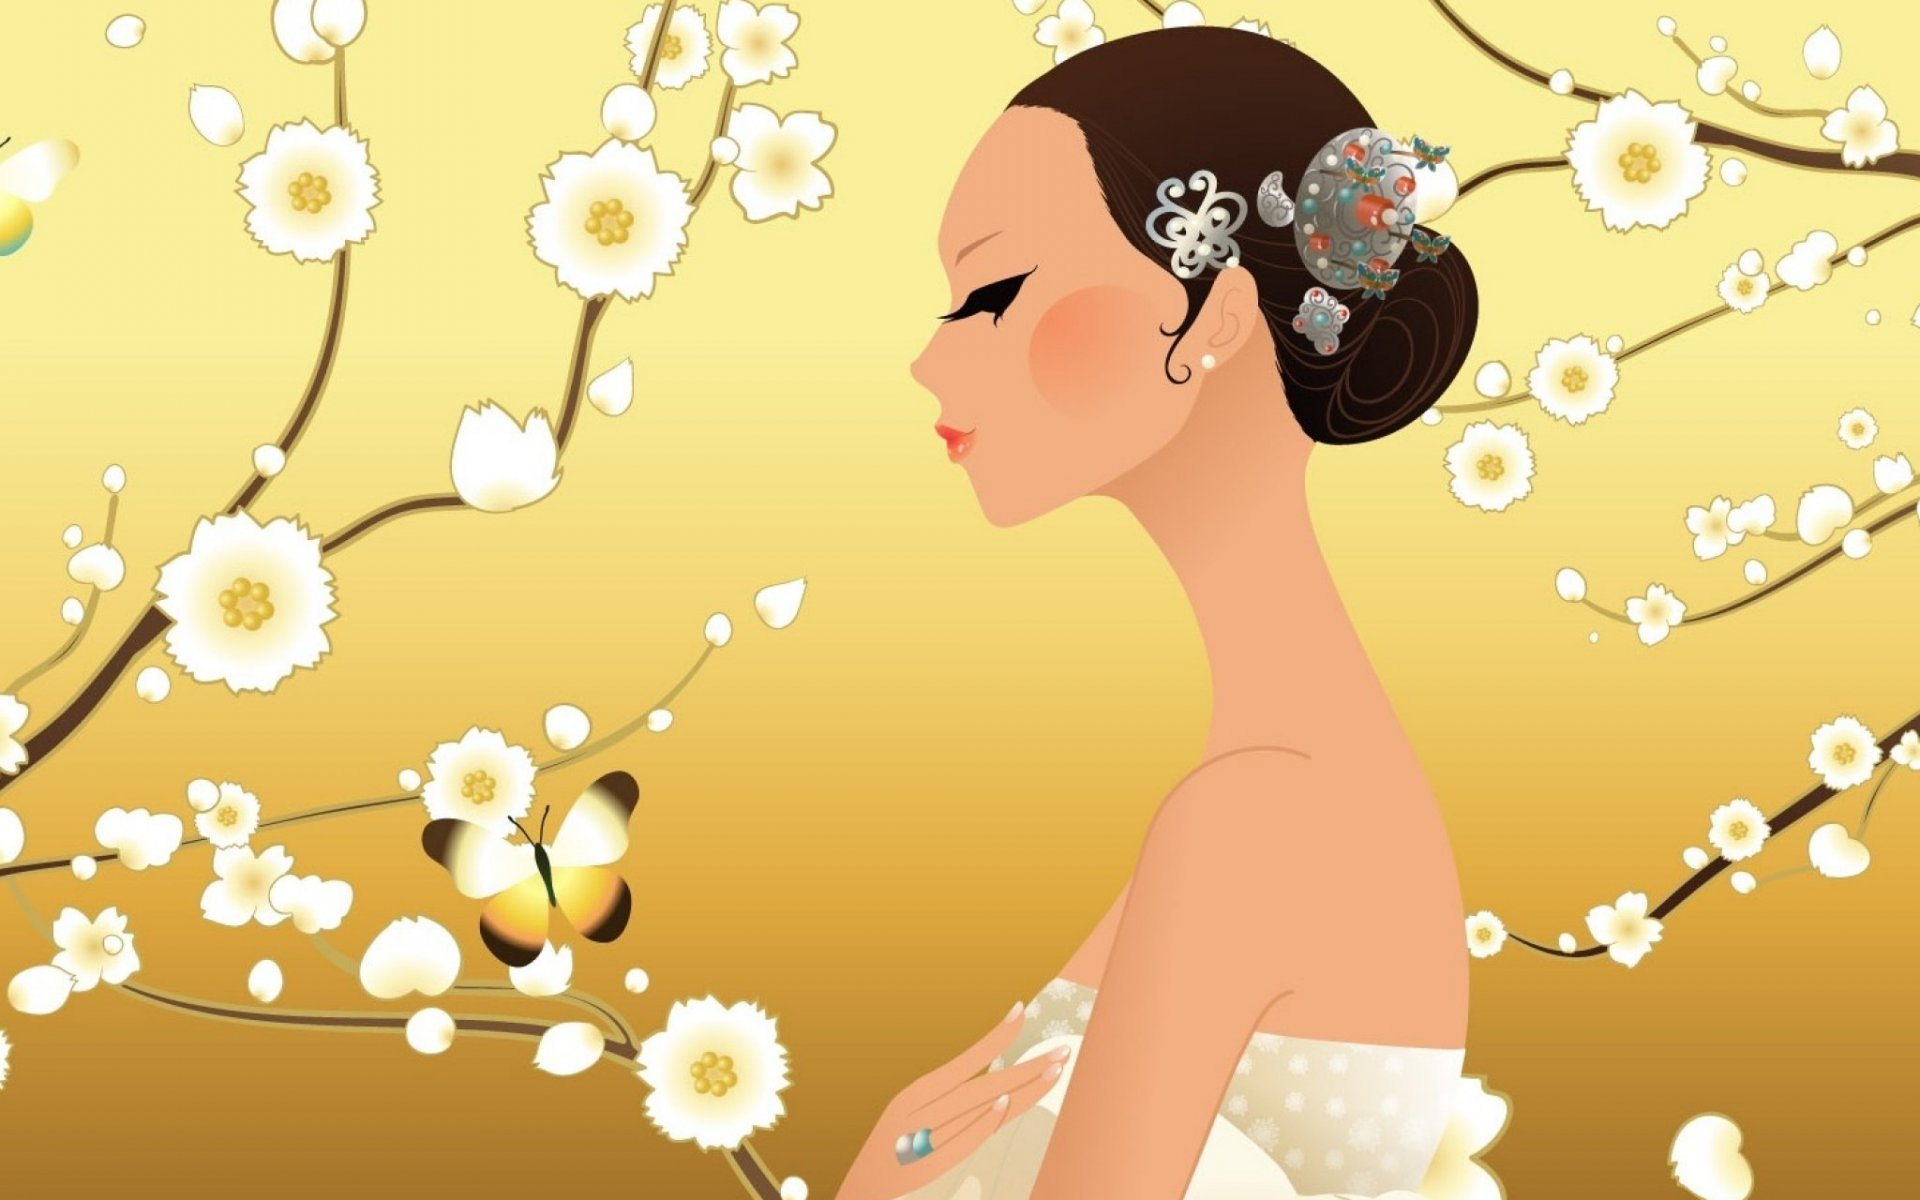 Living room <font><b>home</b></font> wall <font><b>decoration</b></font> fabric posterartistic artwork women female girls girl woman <font><b>asian</b></font> oriental korean under tree